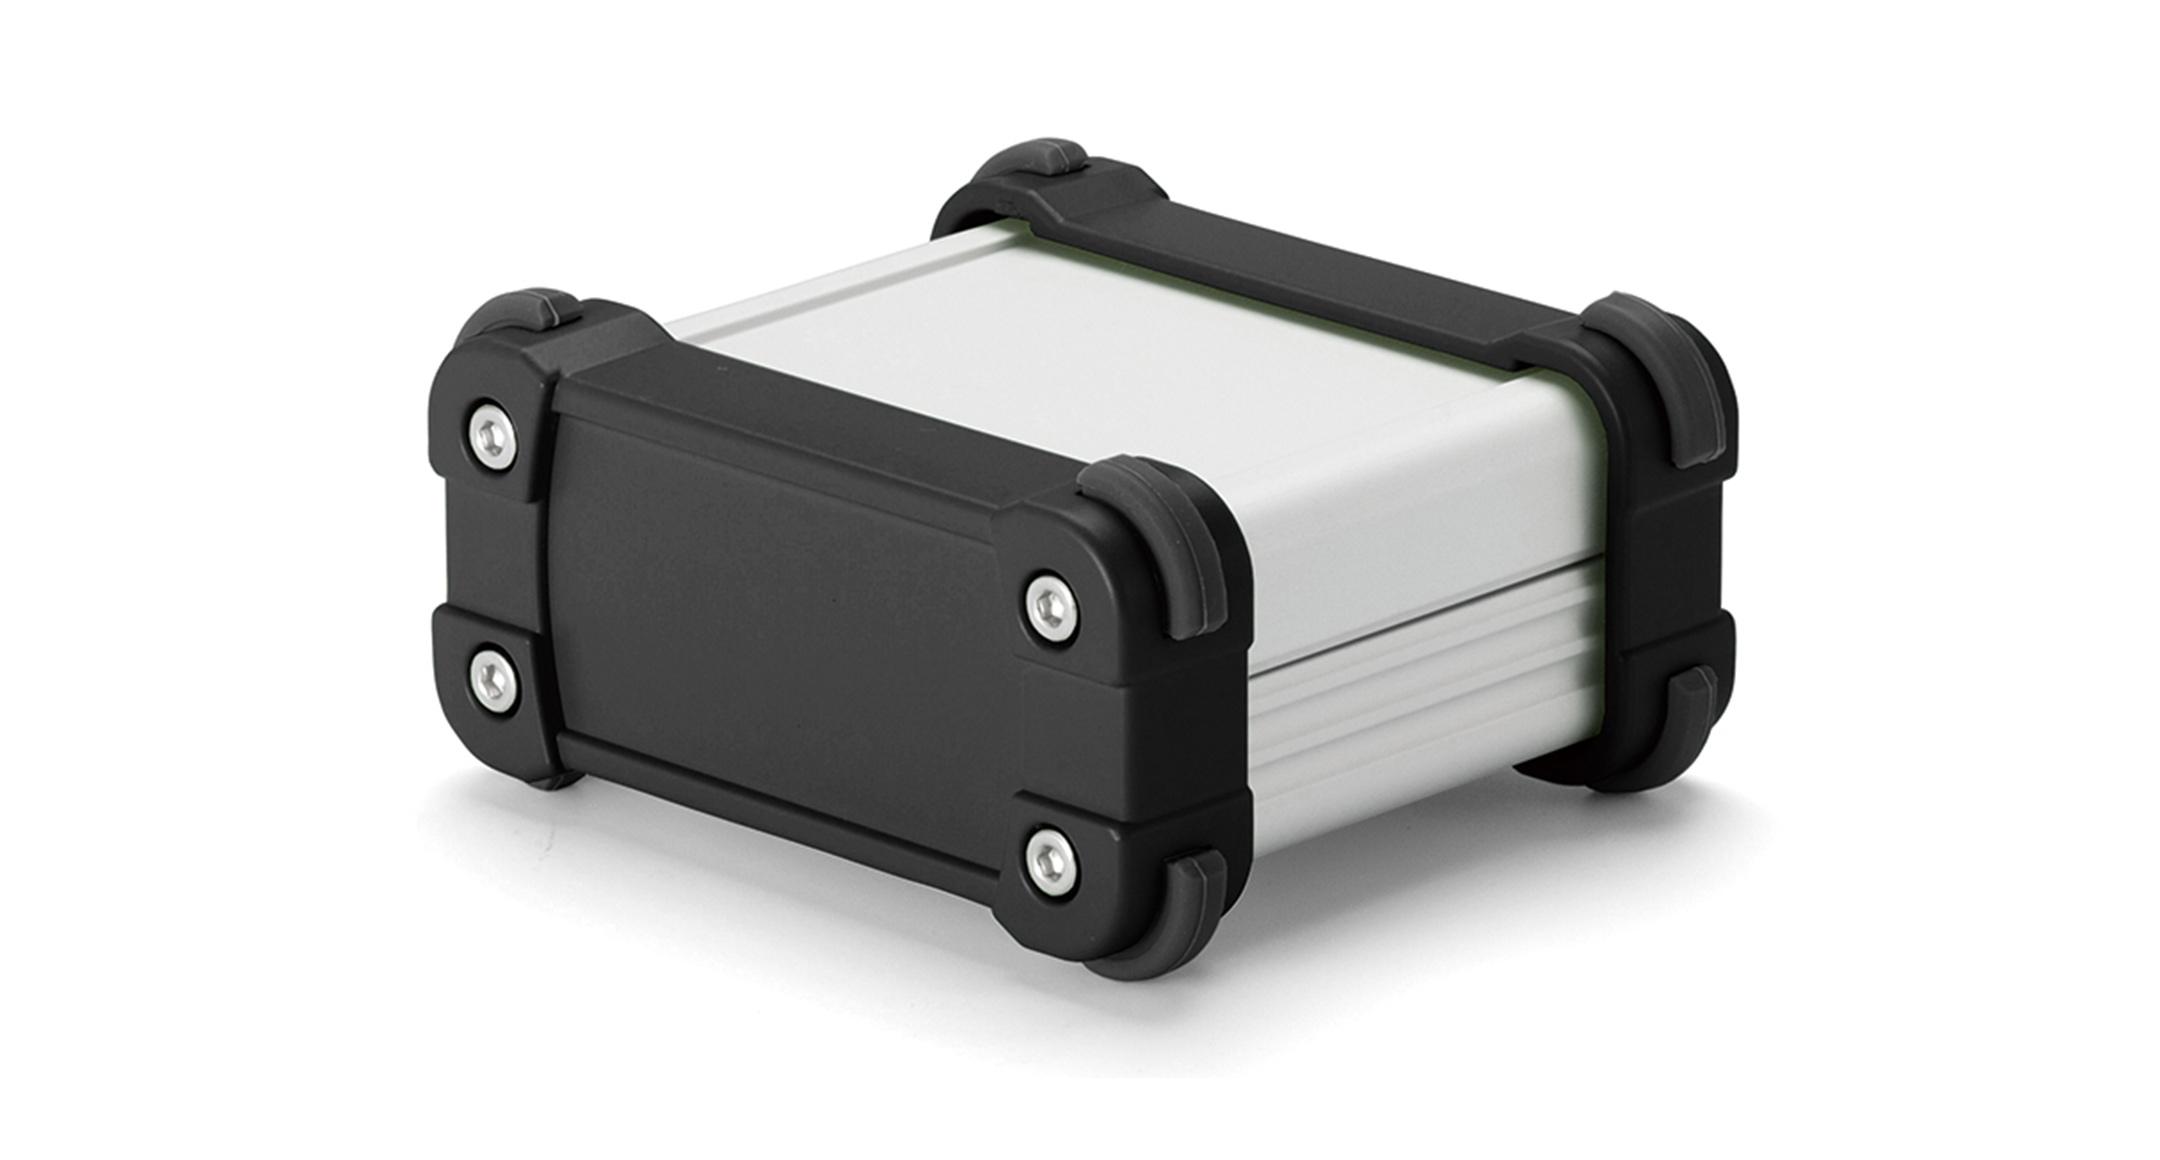 IP65コーナーガード付 防水アルミケース EXWシリーズ:シルバー/ブラックの画像